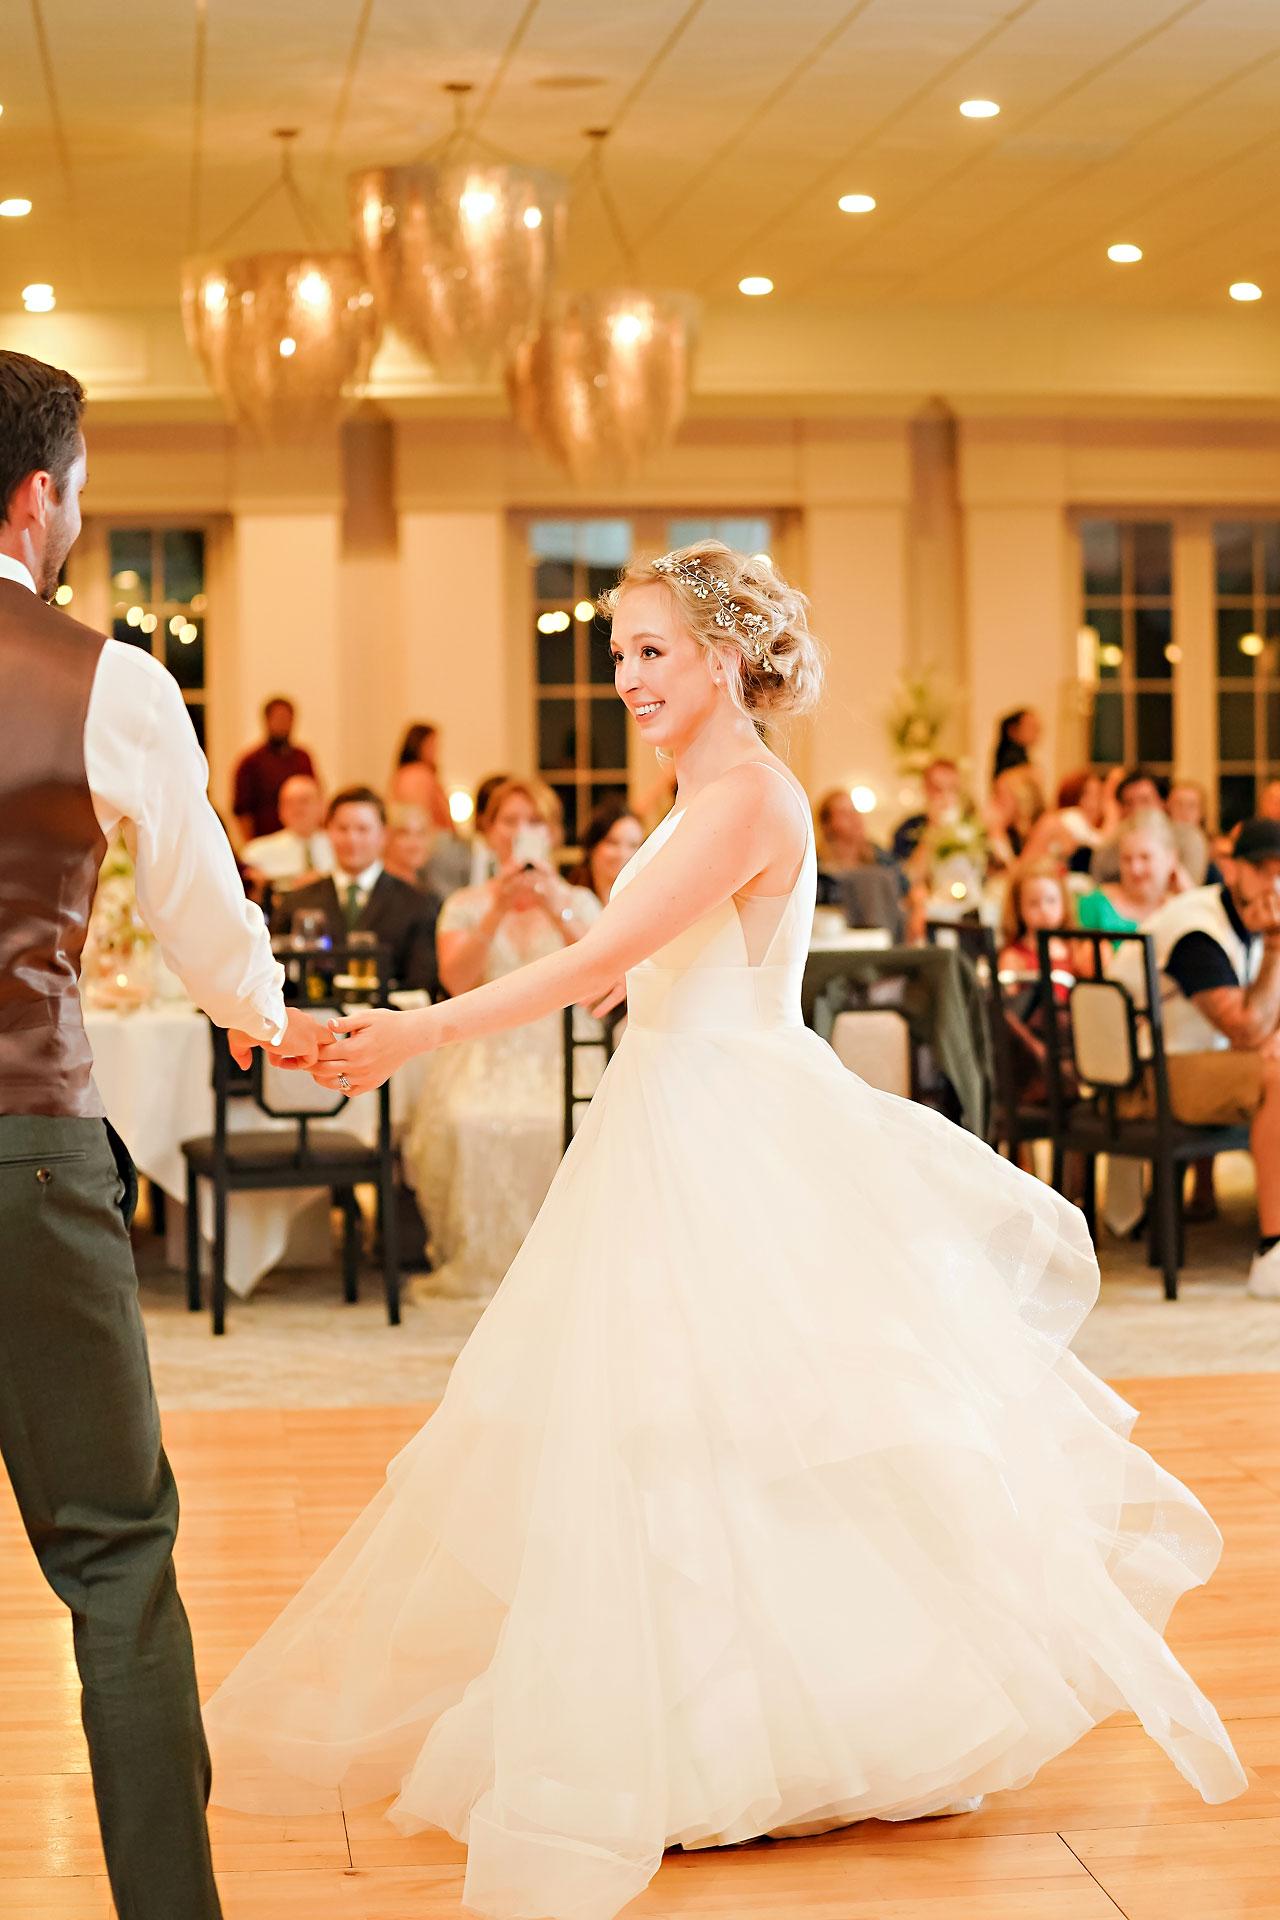 Brylie Jackson Ritz Charles Carmel Indiana Wedding Reception 169